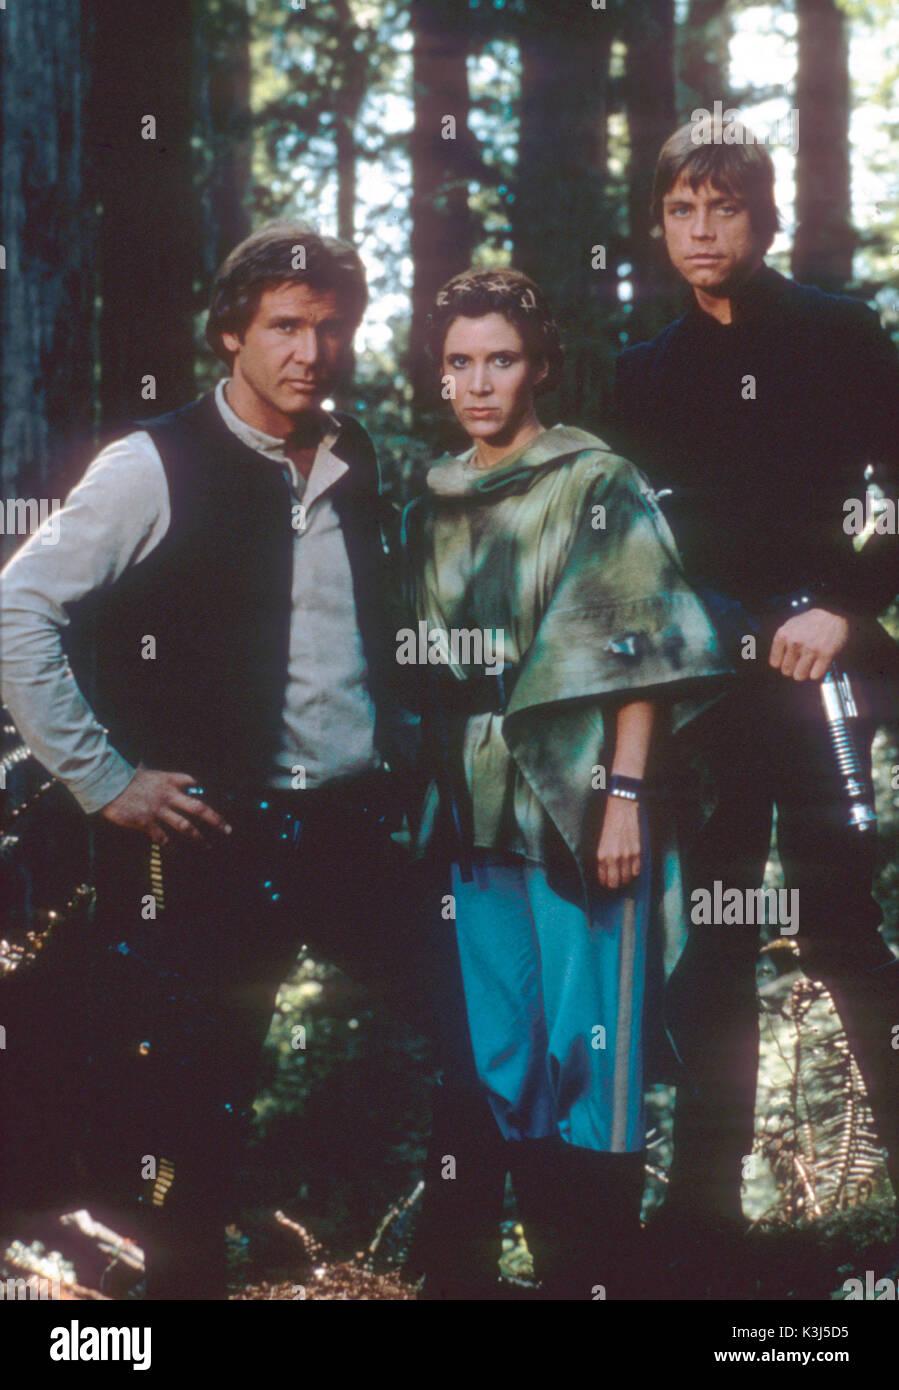 Star Wars Episode Vi Return Of The Jedi Harrison Ford As Han Solo Stock Photo Alamy